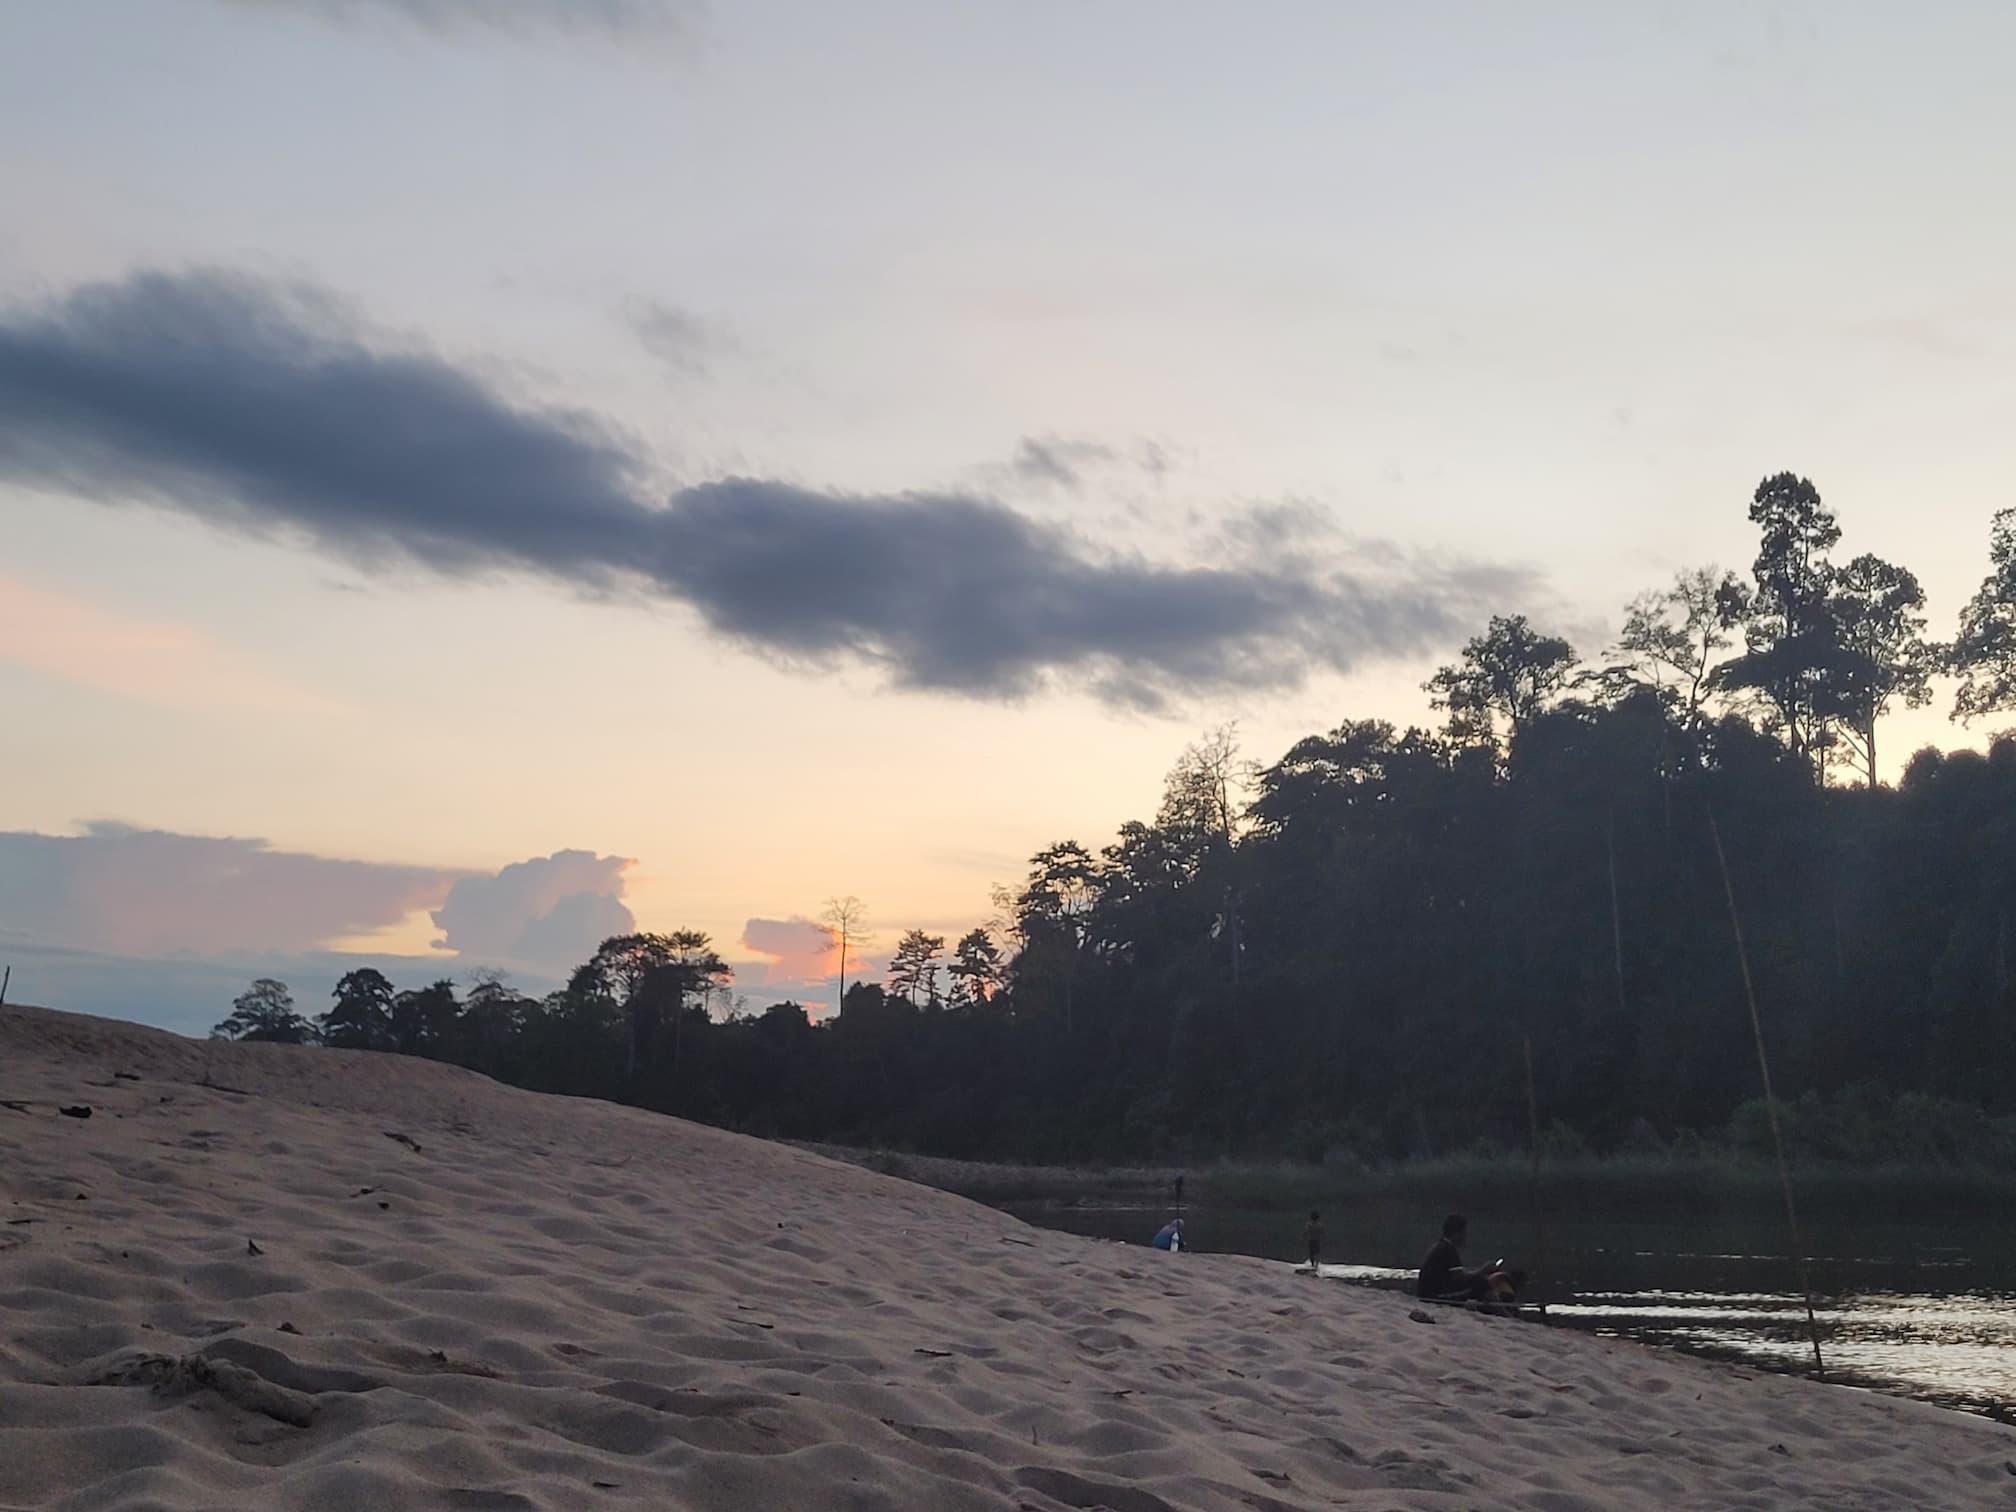 Sungai Keniam